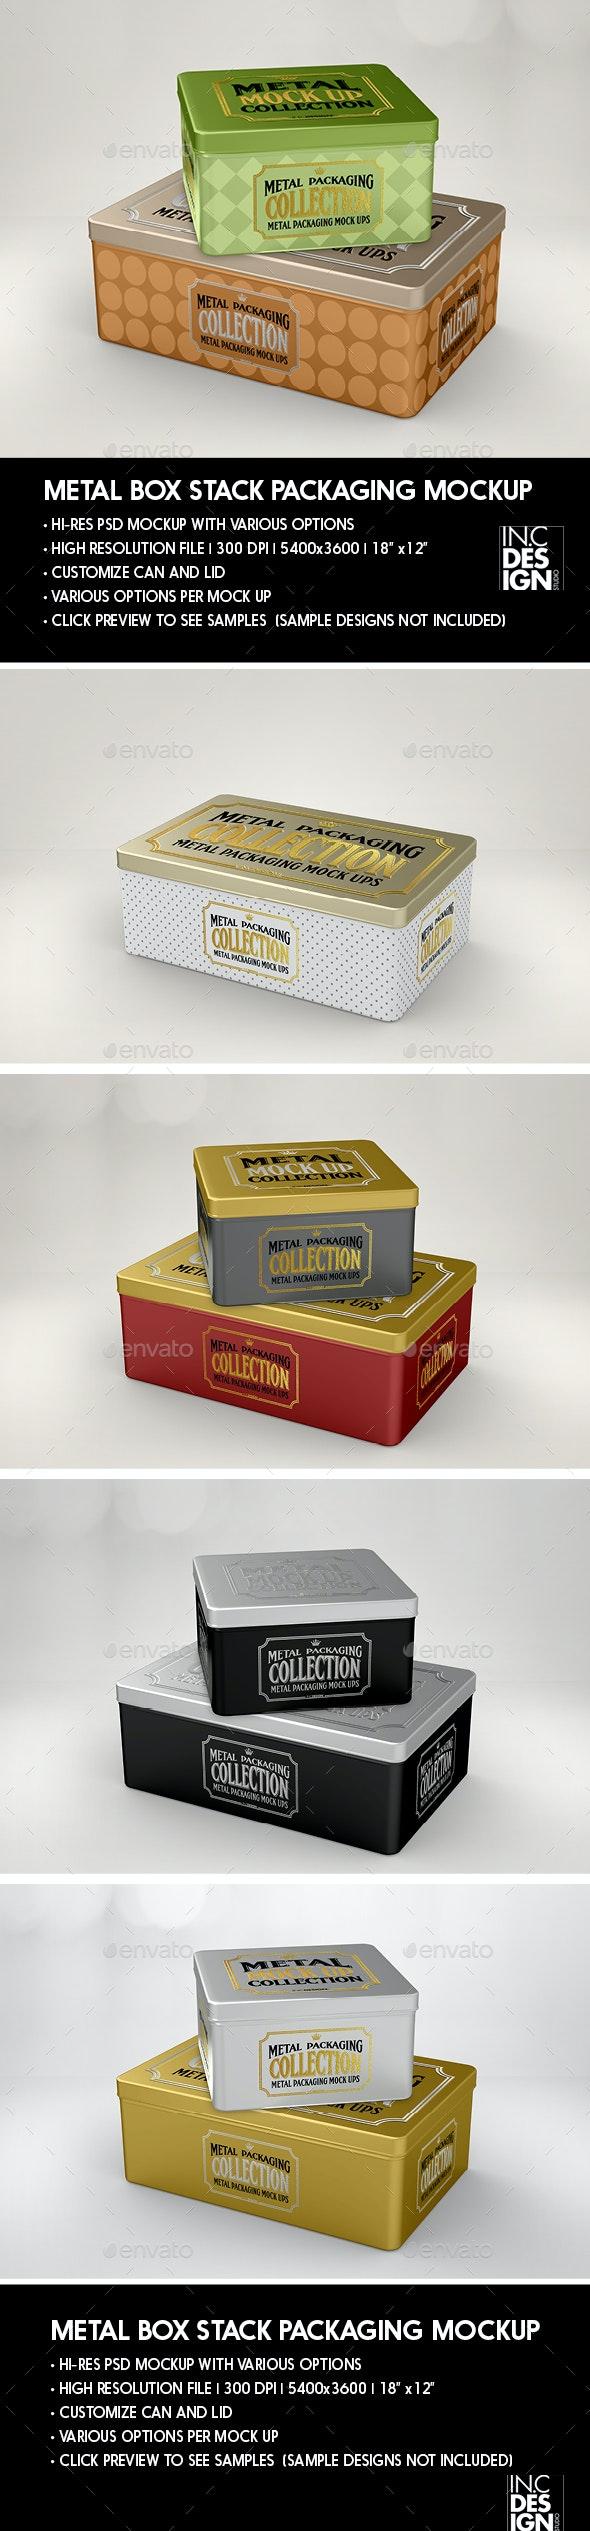 Metal Box Stack Packaging Mockup - Packaging Product Mock-Ups